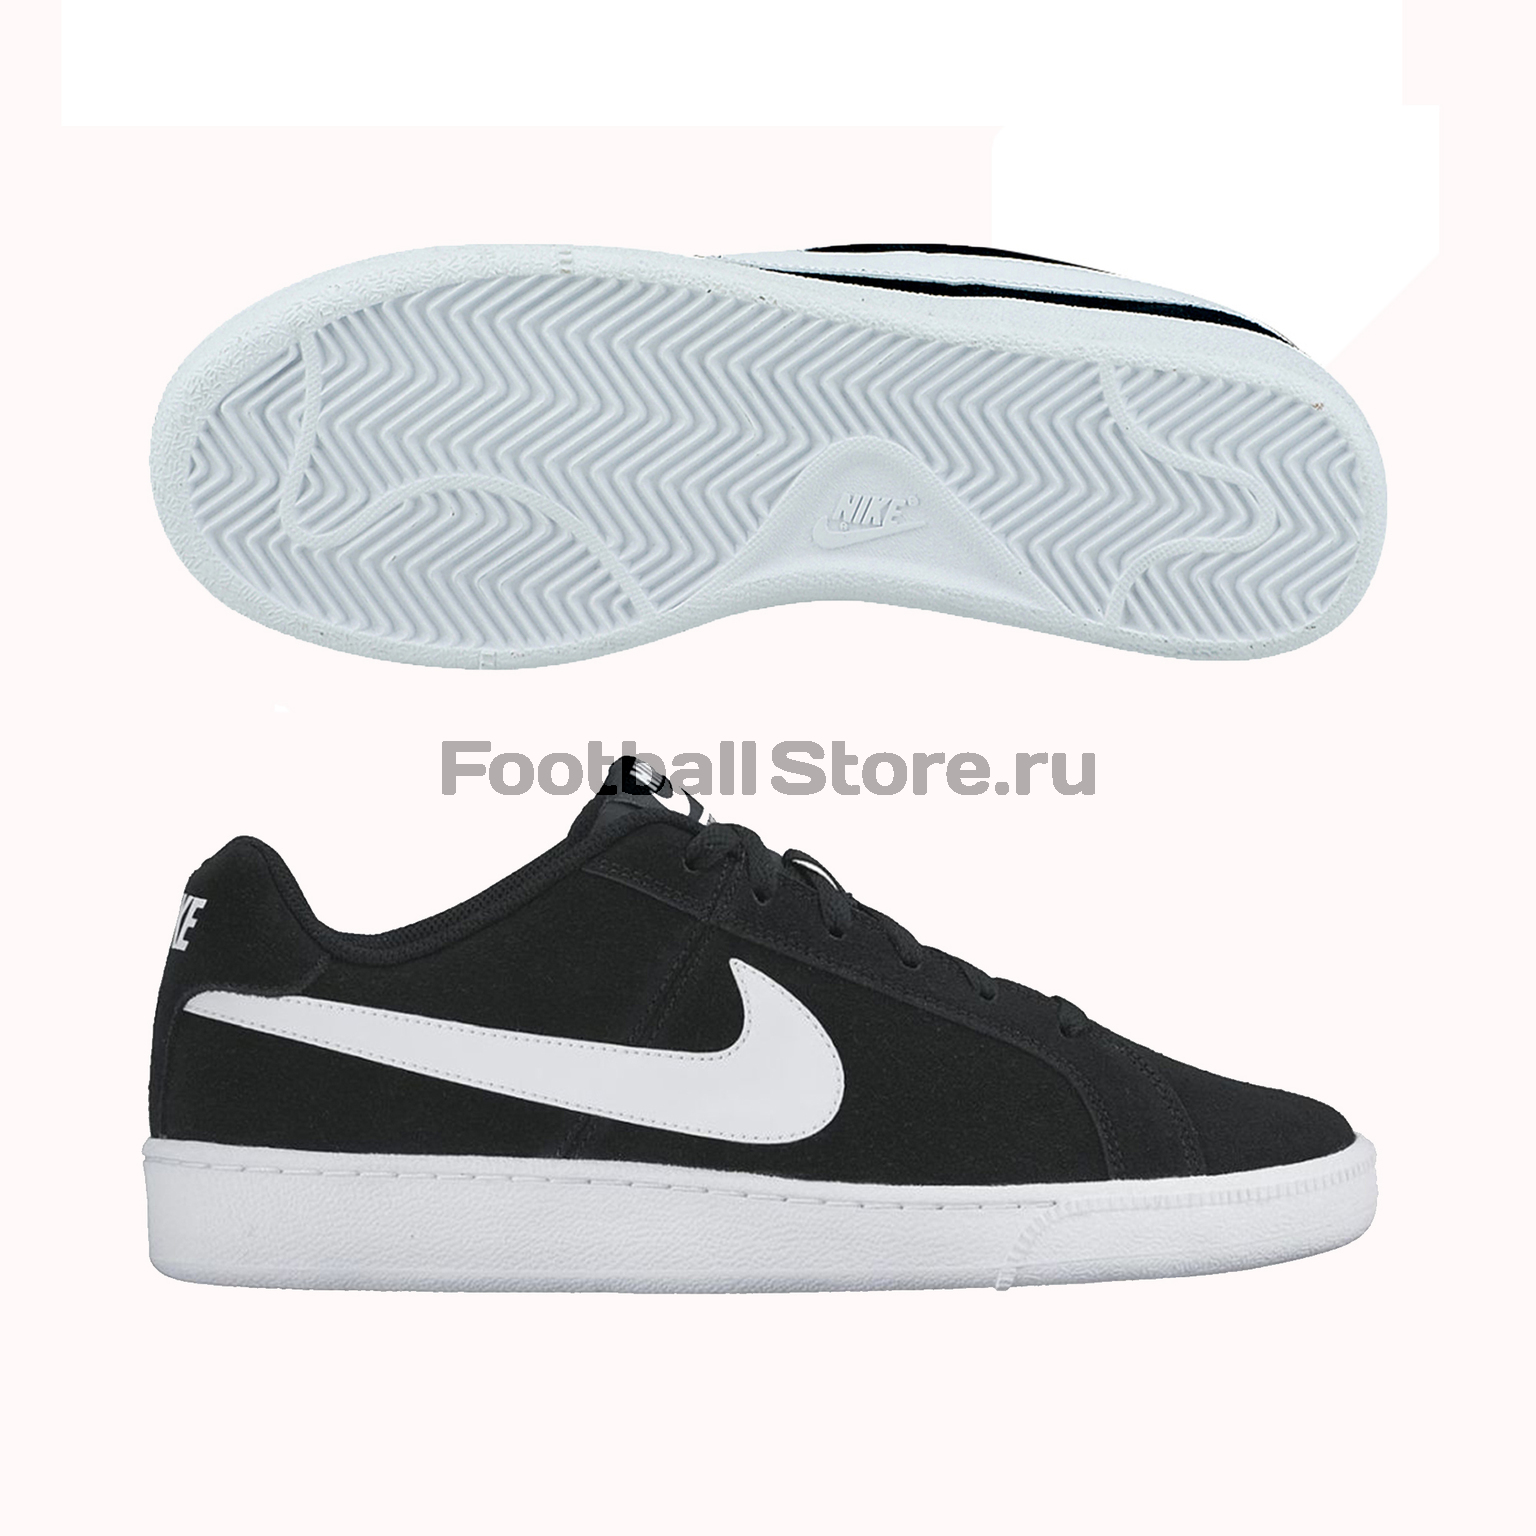 Кроссовки Nike Court Royale Suede 819802-011 сникеры nike сникеры wmns nike court borough mid